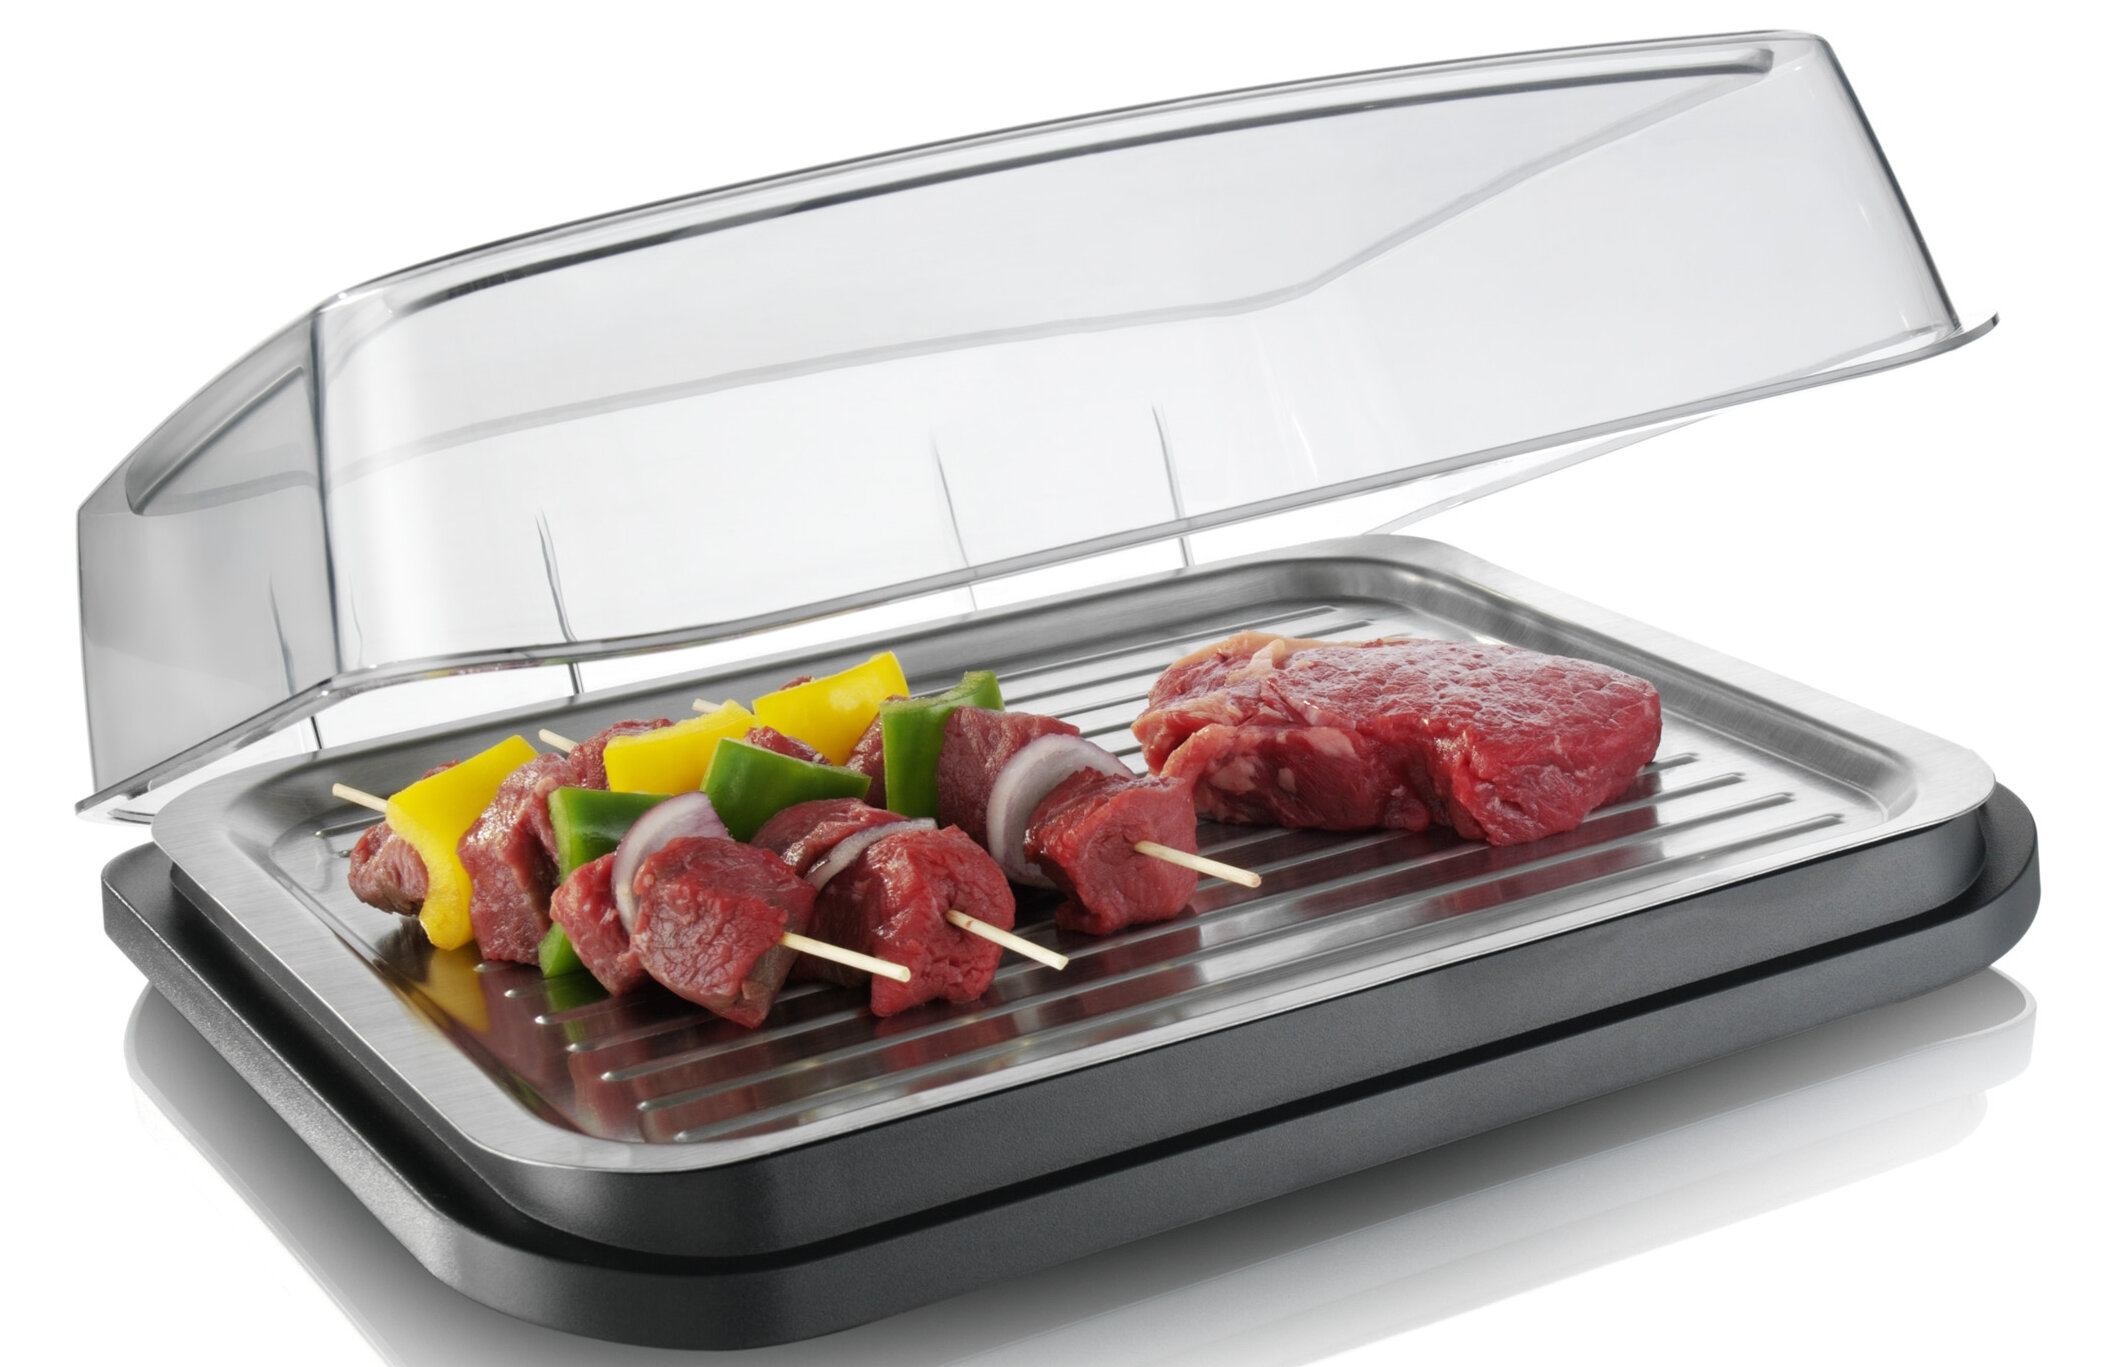 Kühlschrank Box : Vacu vin kühlschrankbox wayfair